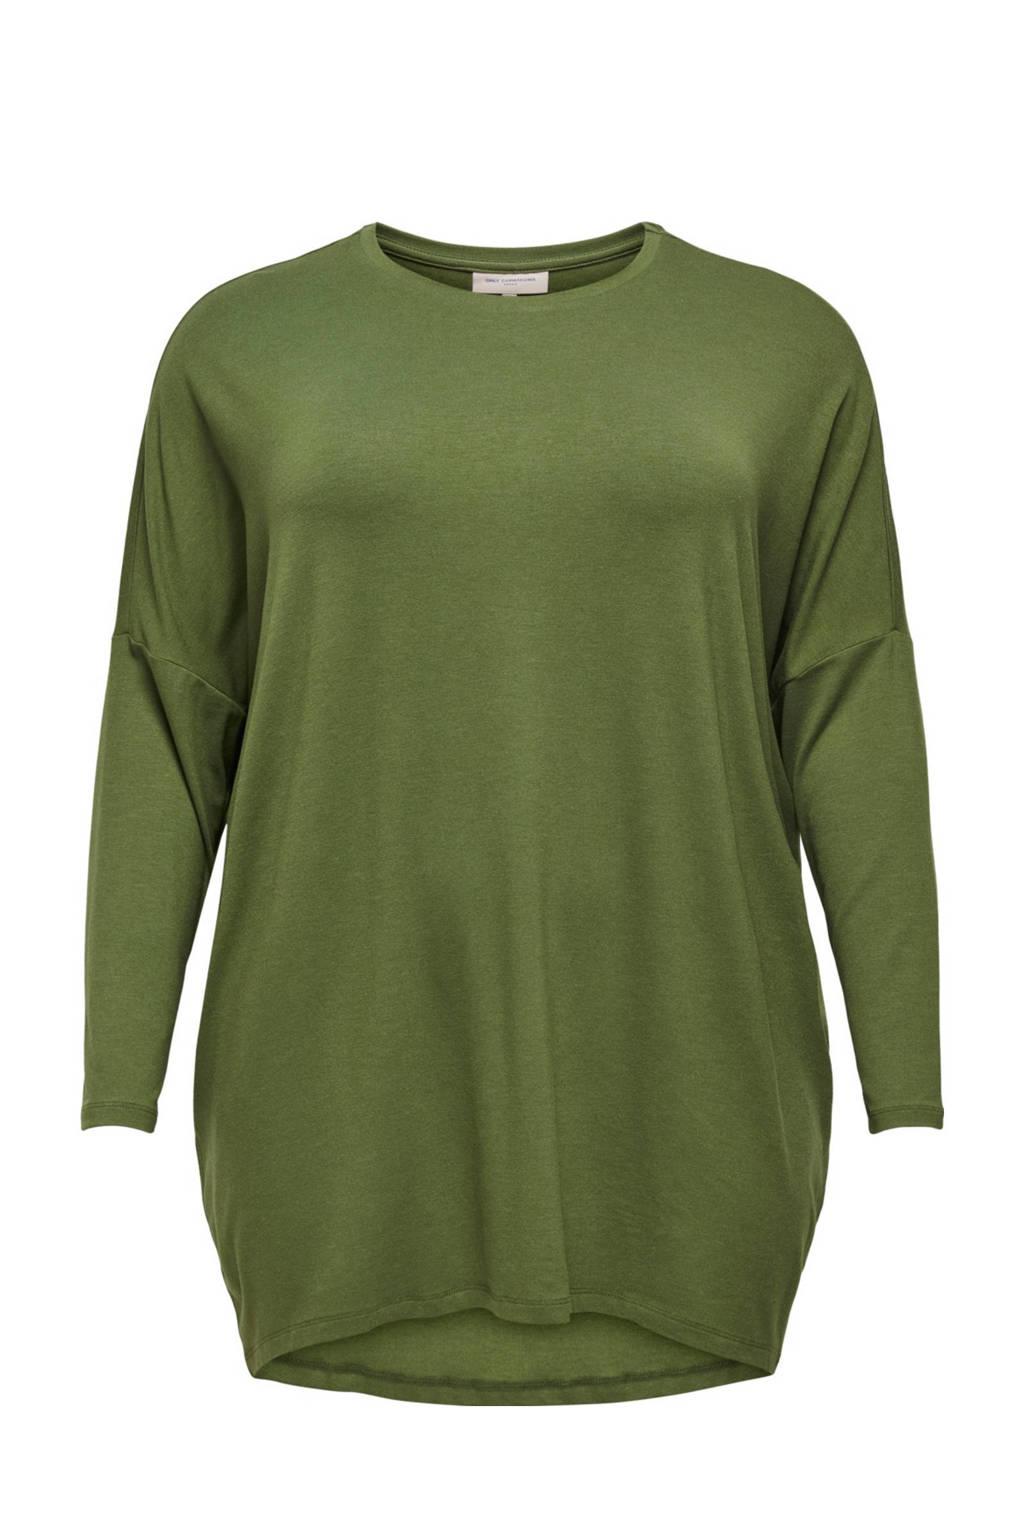 ONLY CARMAKOMA top groen, Groen